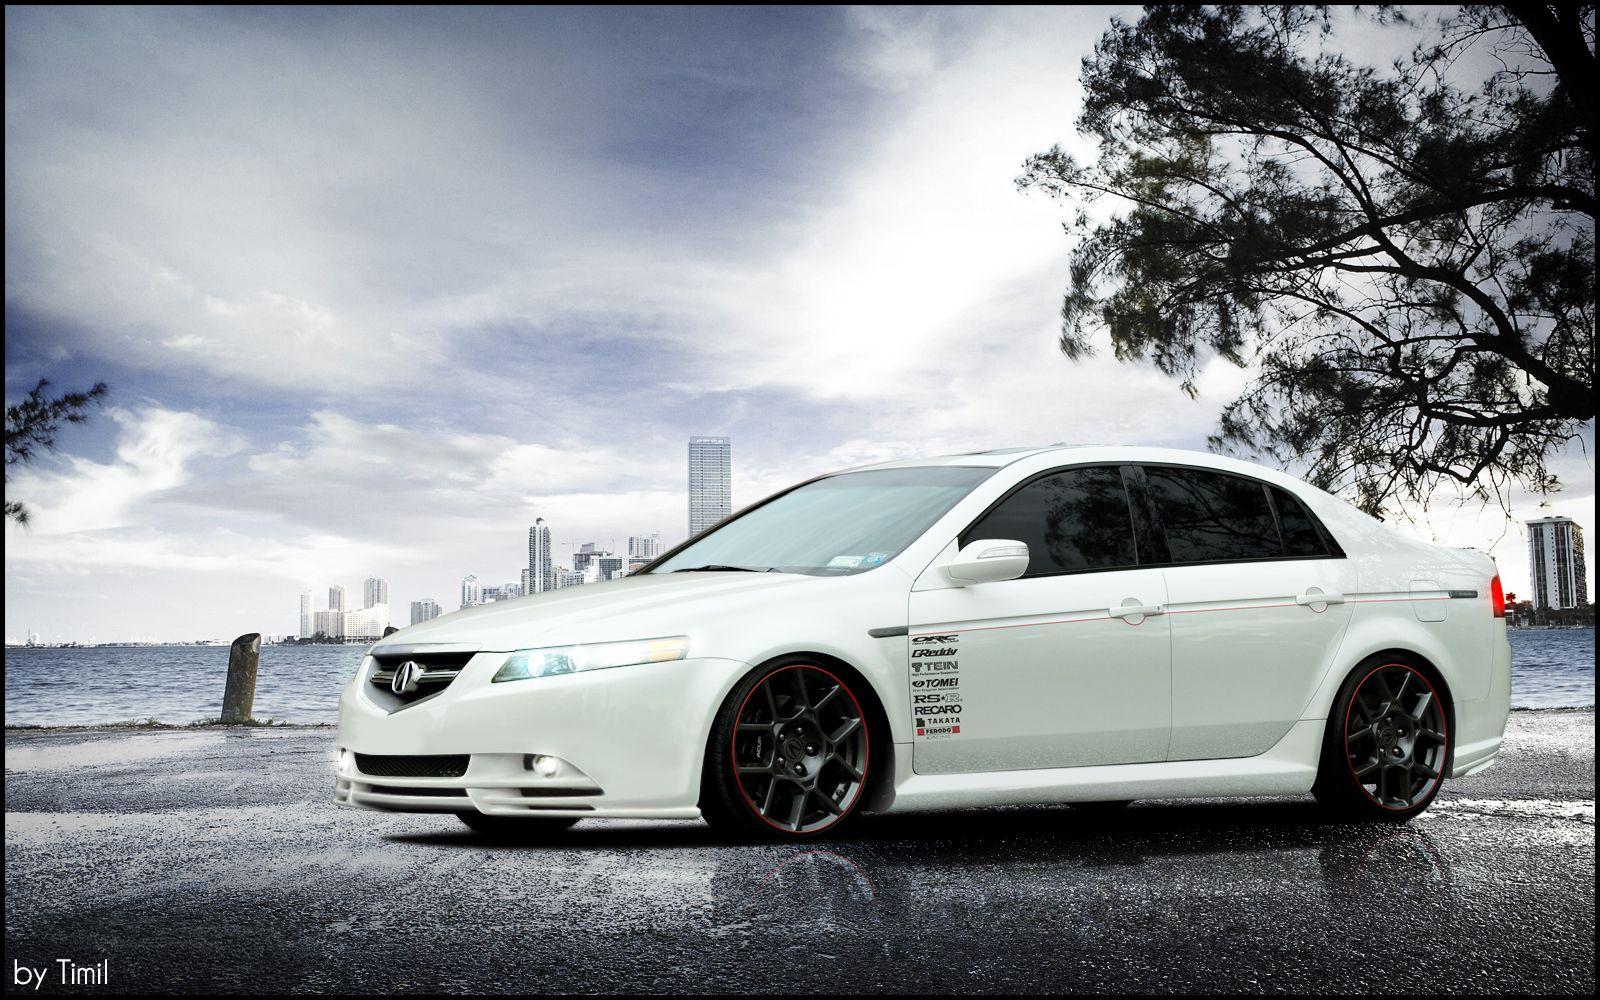 Turbo Tl Type S - Acura Tl Type S - Turbo Tl Type S